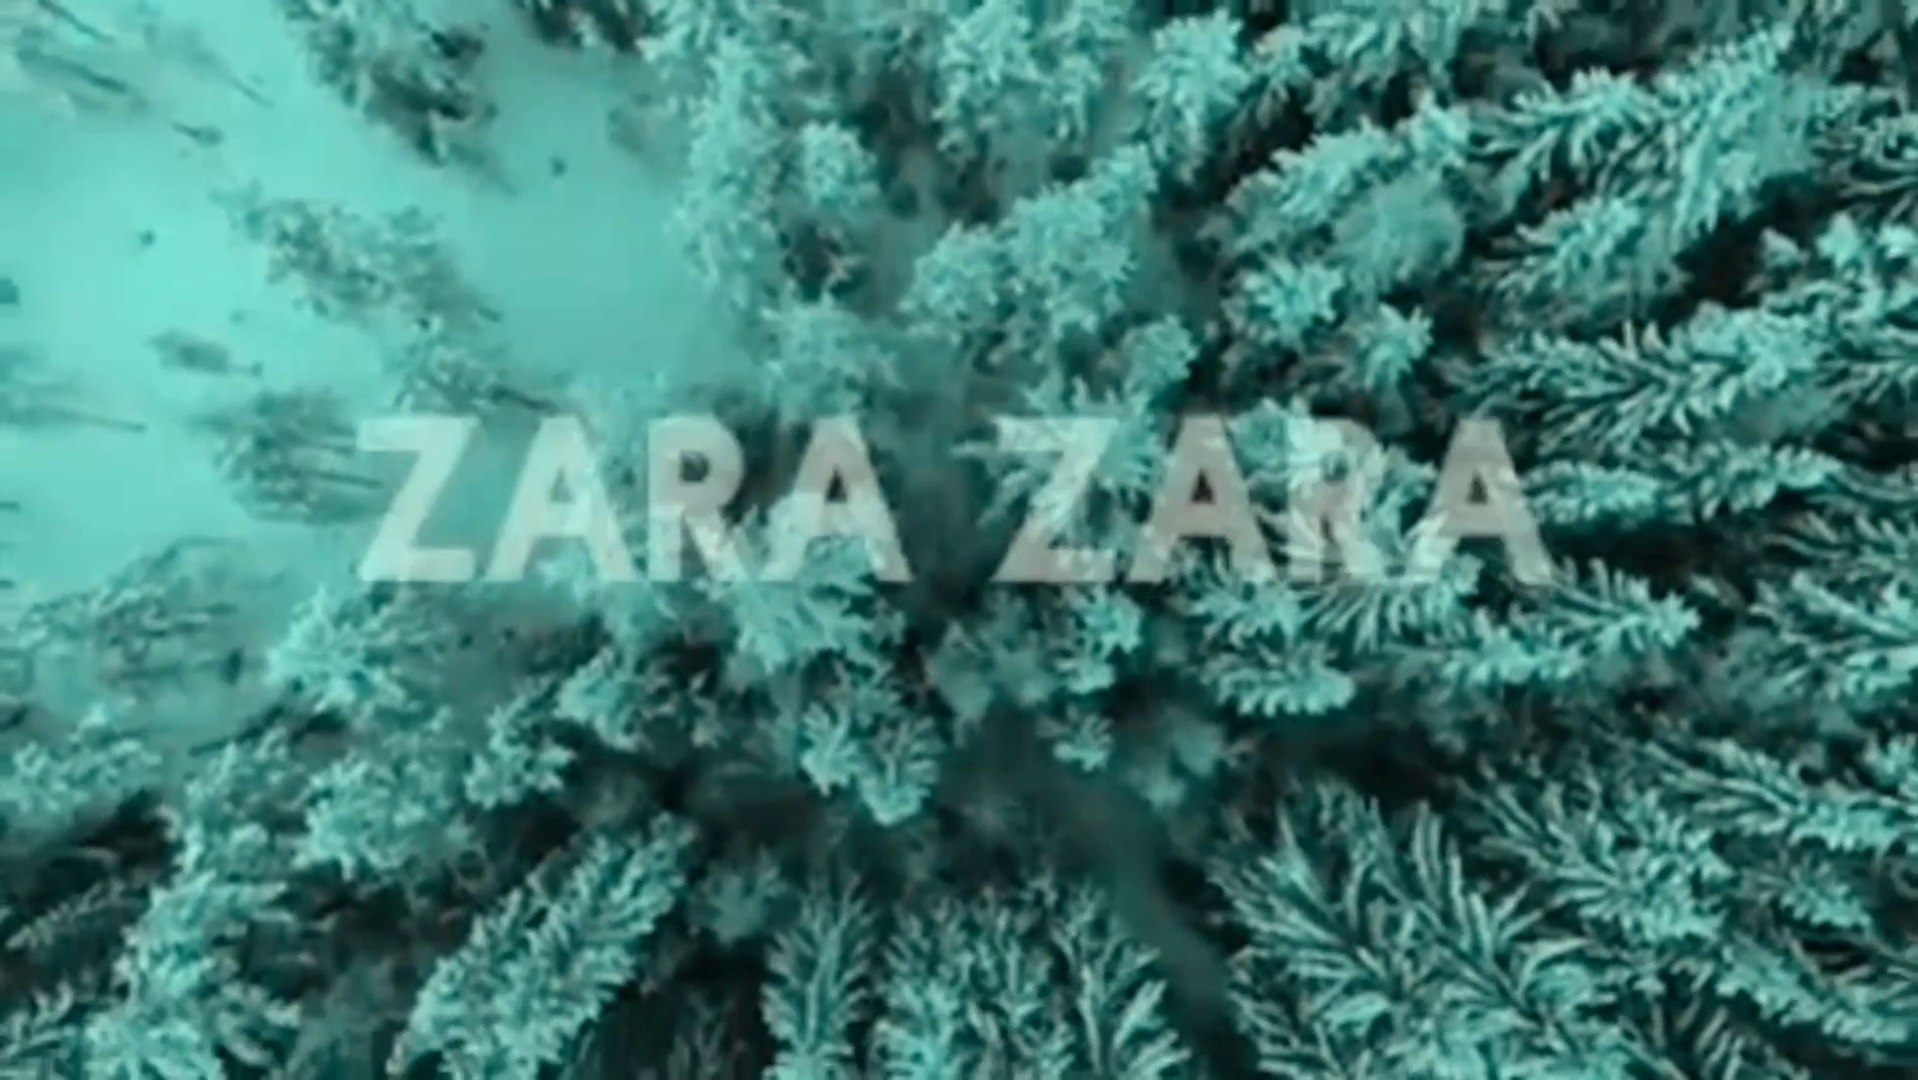 ZARA  ZARA  || MASHUP 2020 - ASHRAF GADDI || NEW SONG HINDI